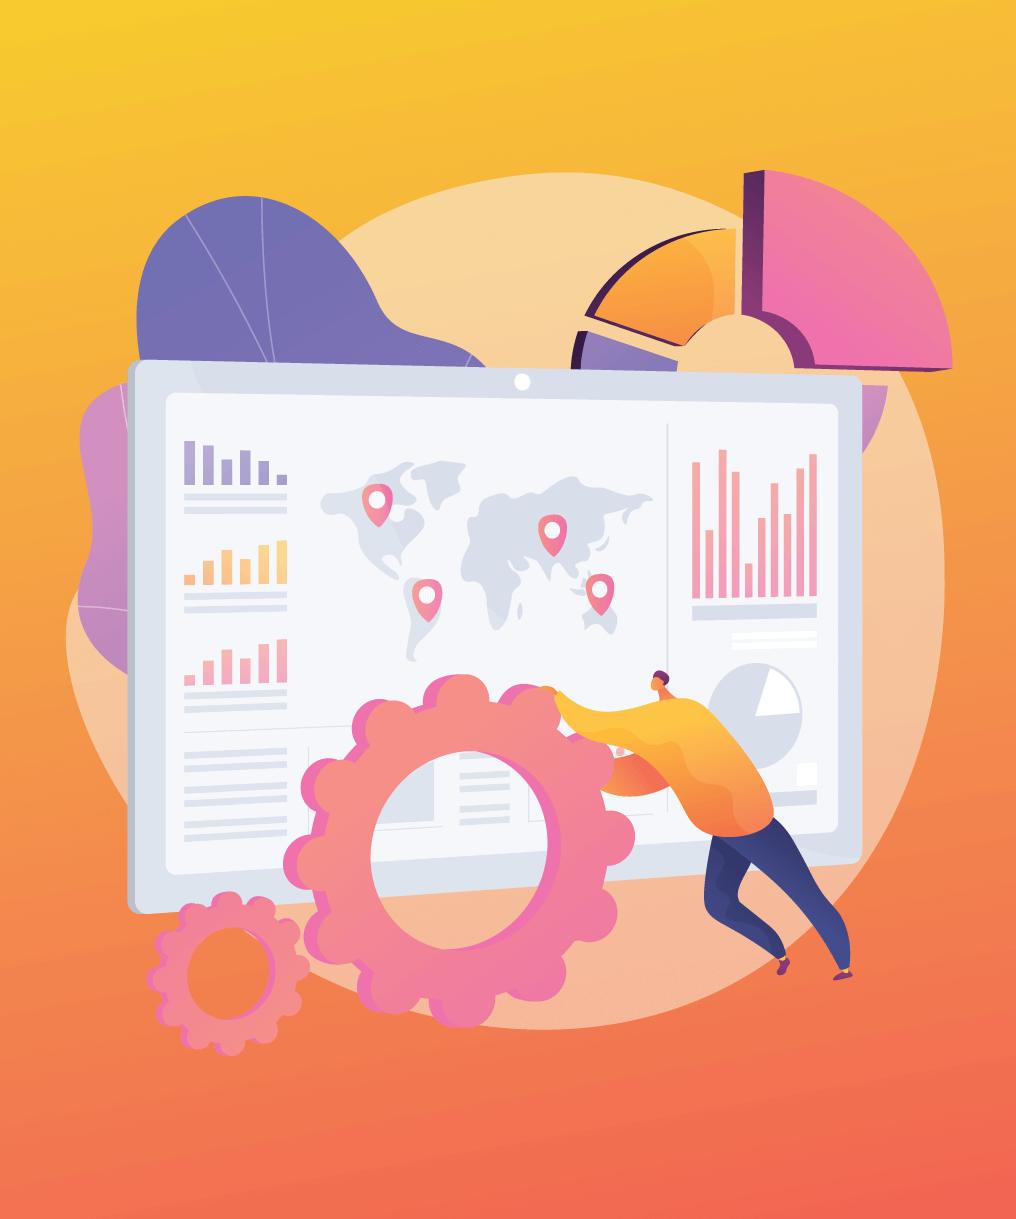 google analytics, tableau, data analytics, data science, data science consulting, big data